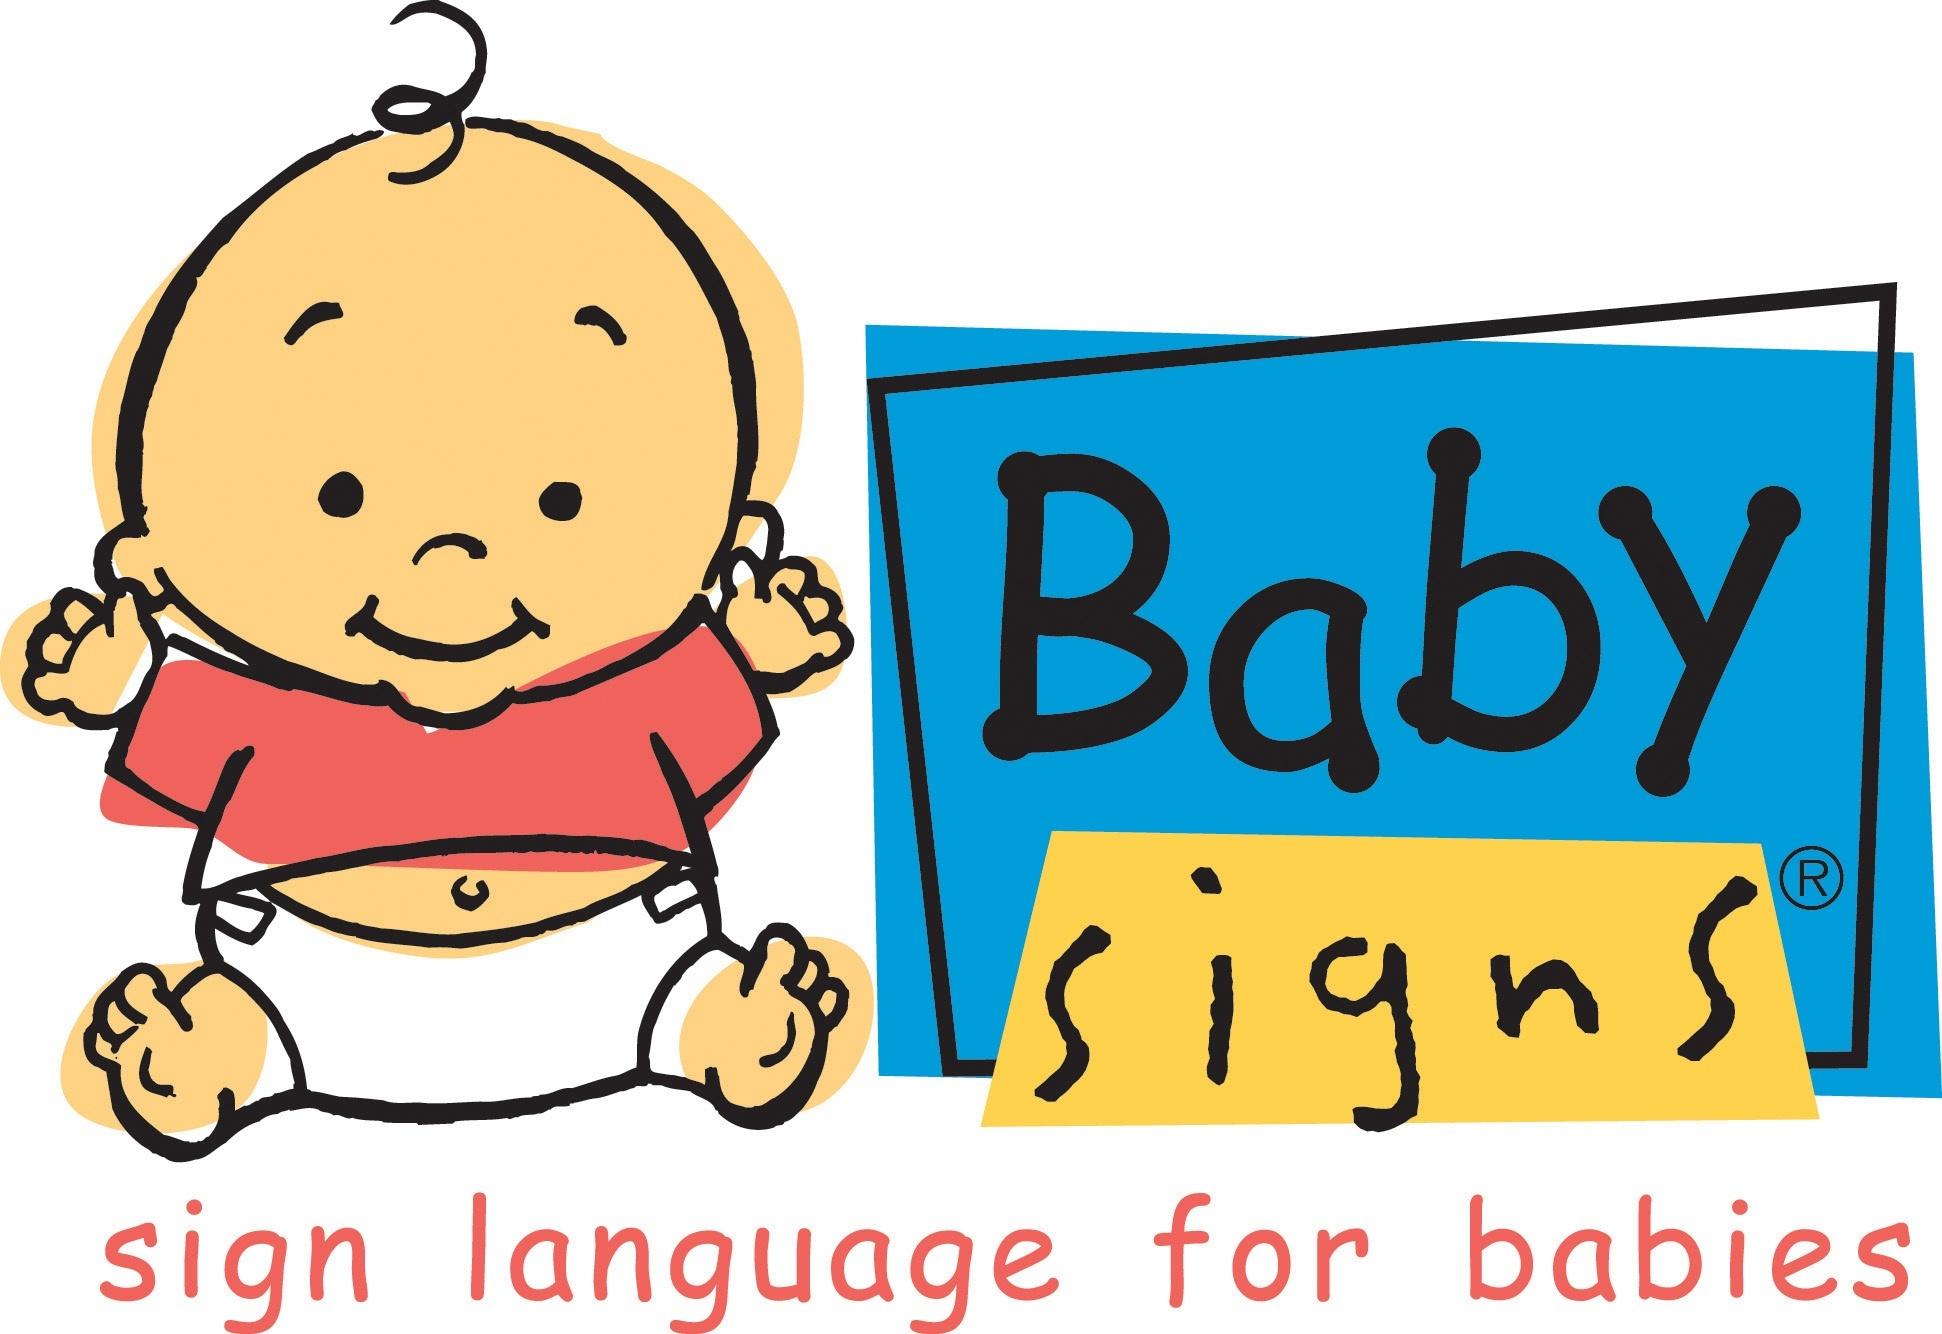 BabySignsLogo2-2.jpg